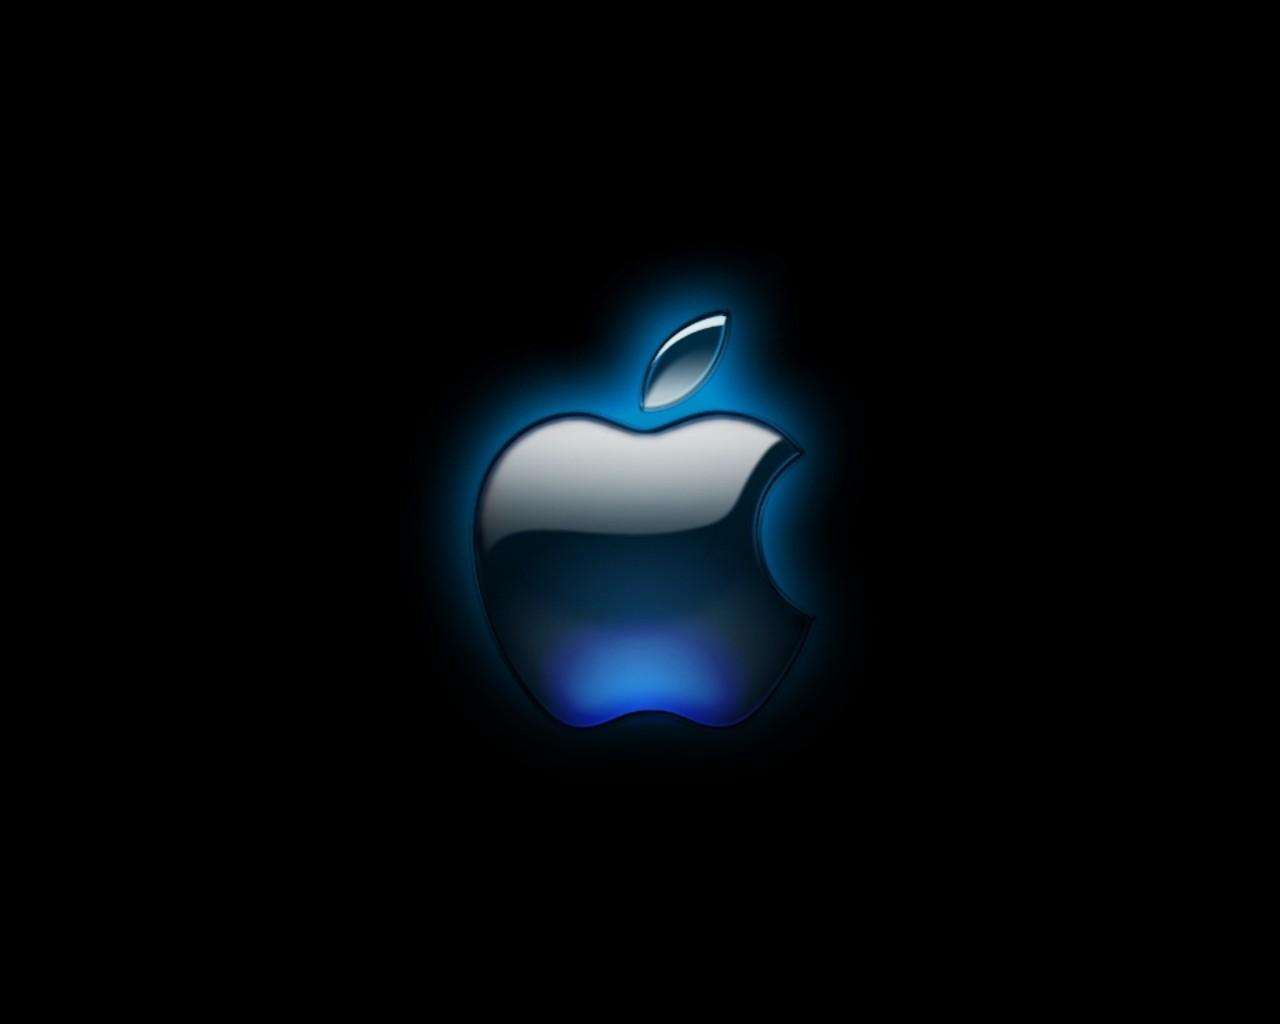 50+] Apple Logo Wallpaper on WallpaperSafari